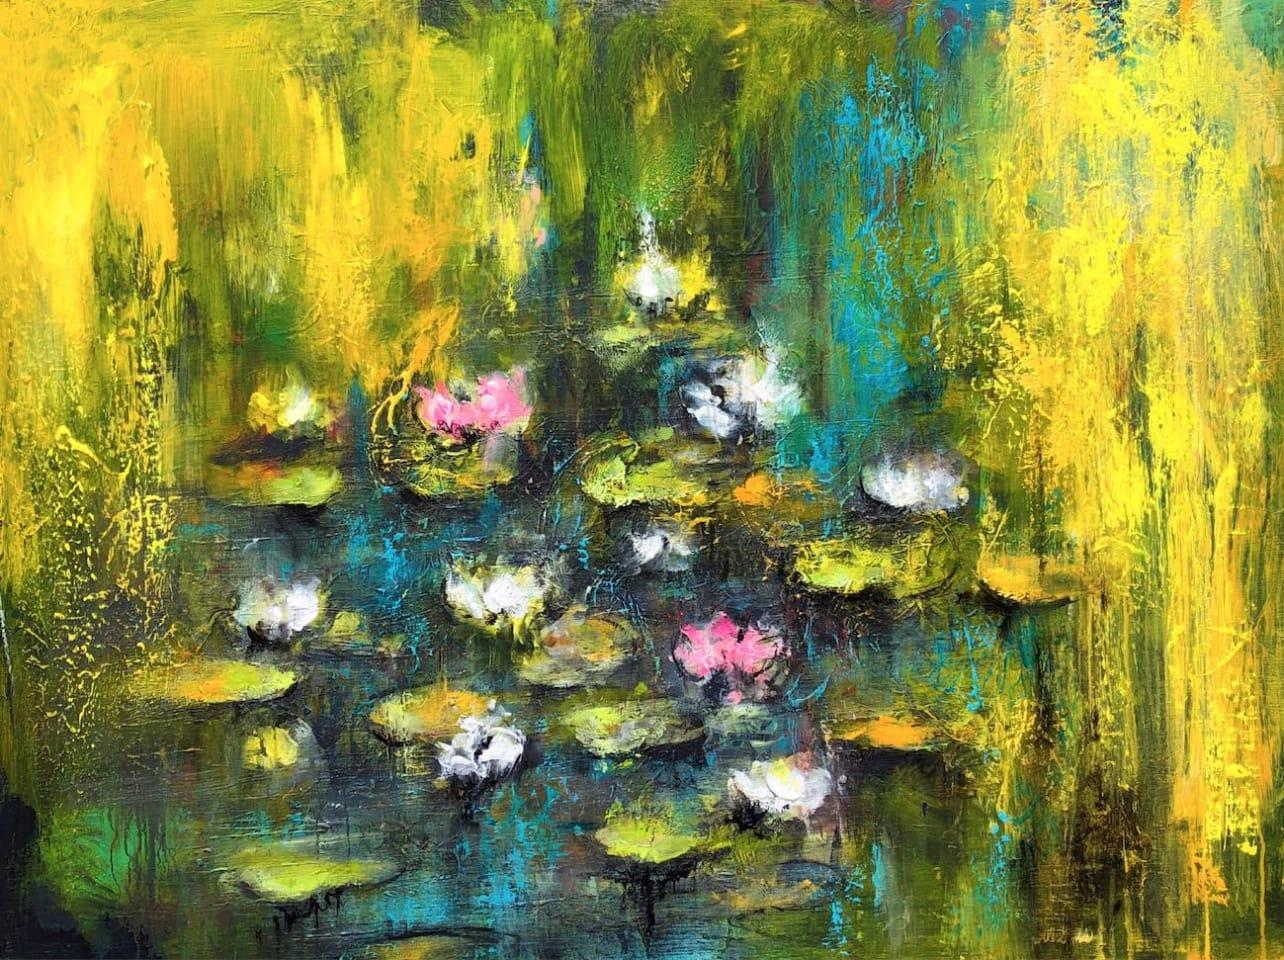 Daniel Hooper, Lilies Under The Willow, 2020